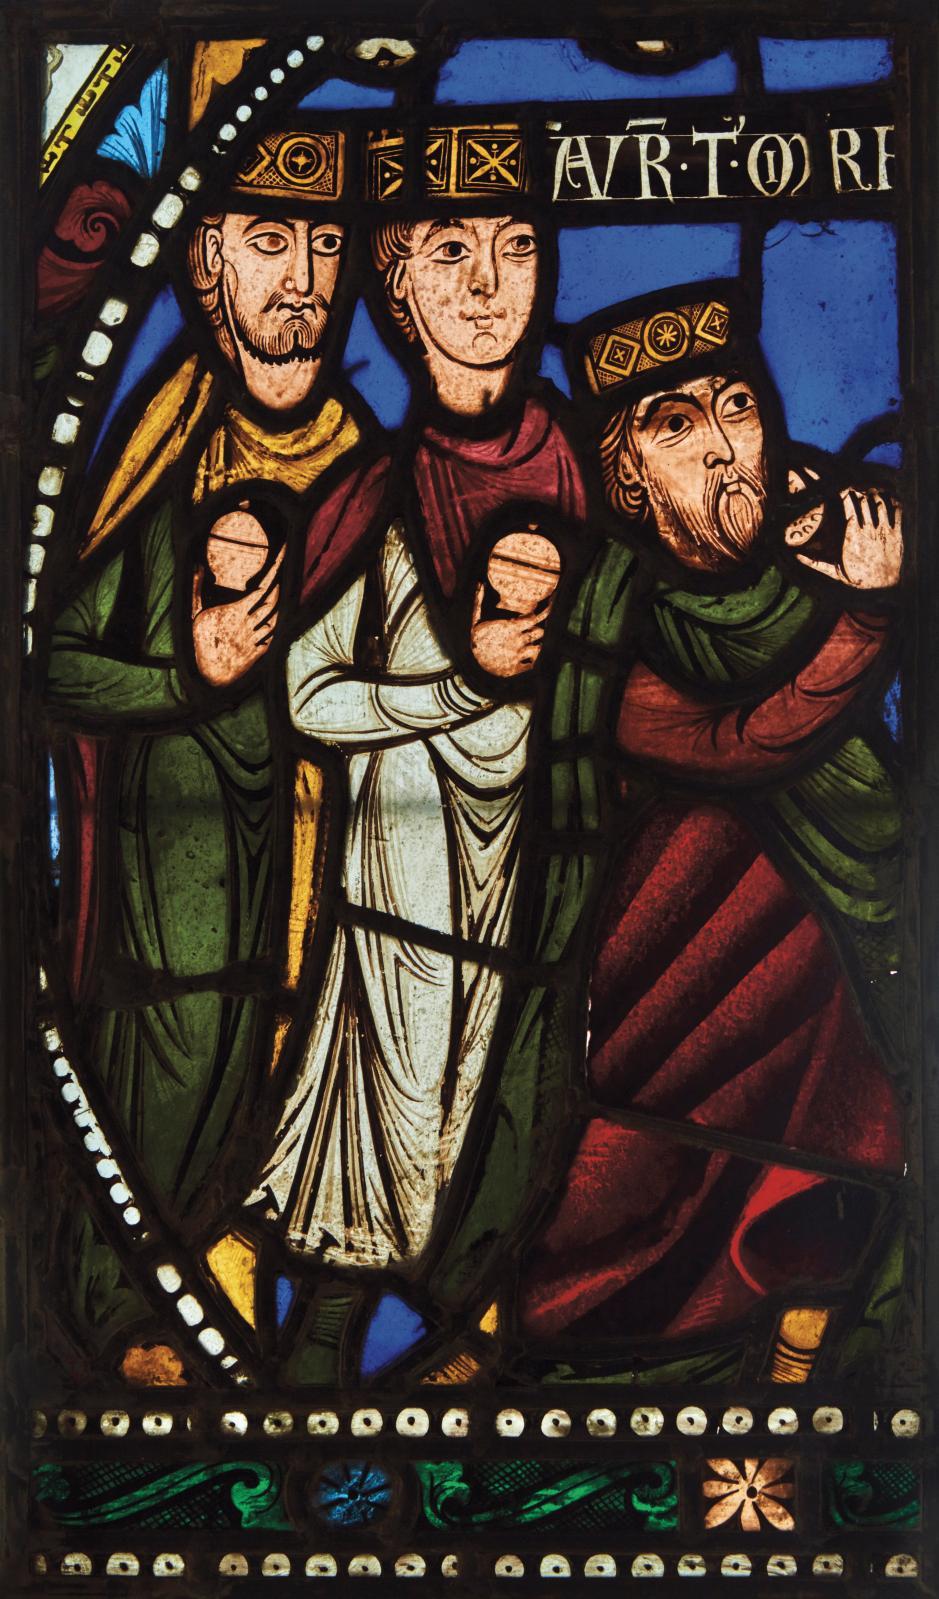 Les vitraux  du XIIIéme siècle . - Page 2 7050310